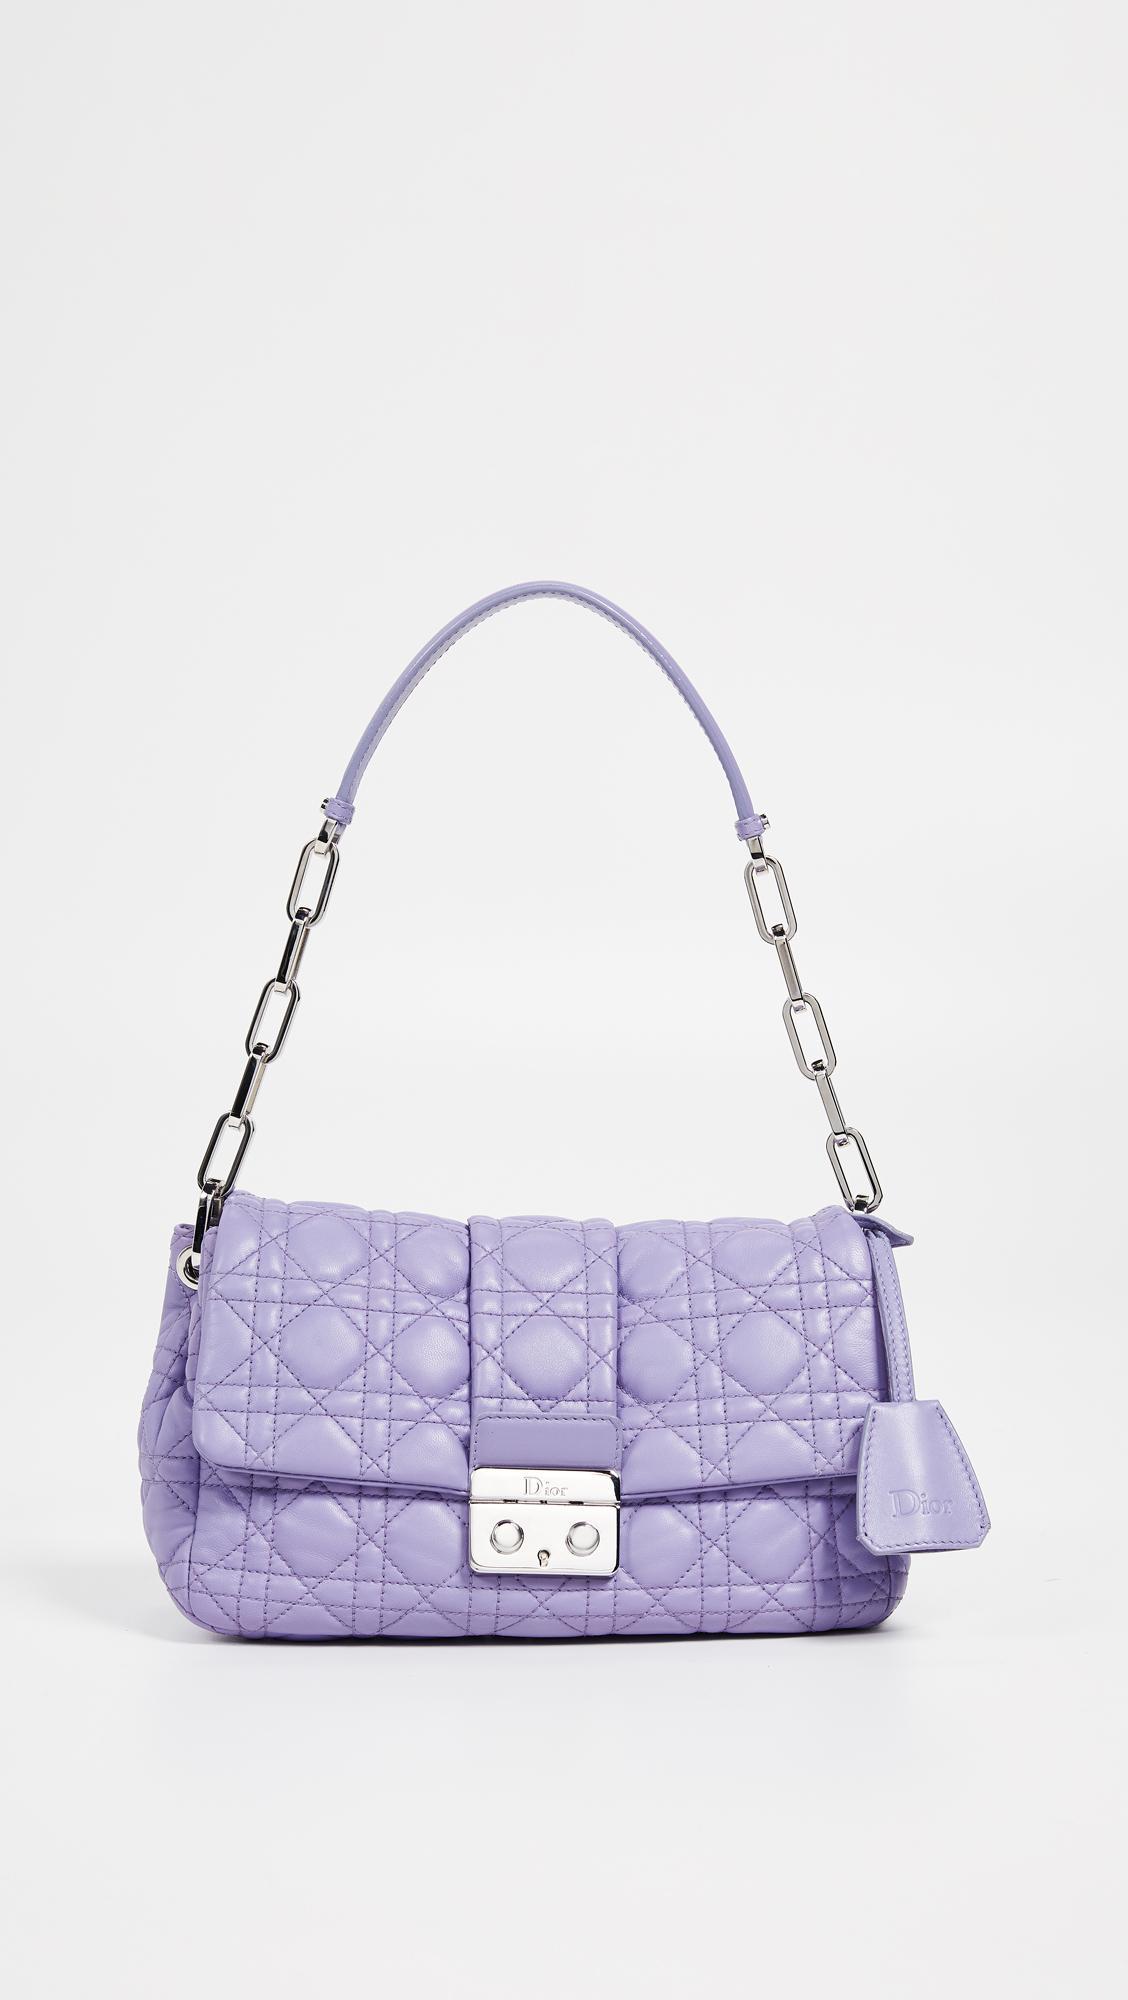 559949042c84 What Goes Around Comes Around Dior Purple Lambskin New Lock Bag in ...